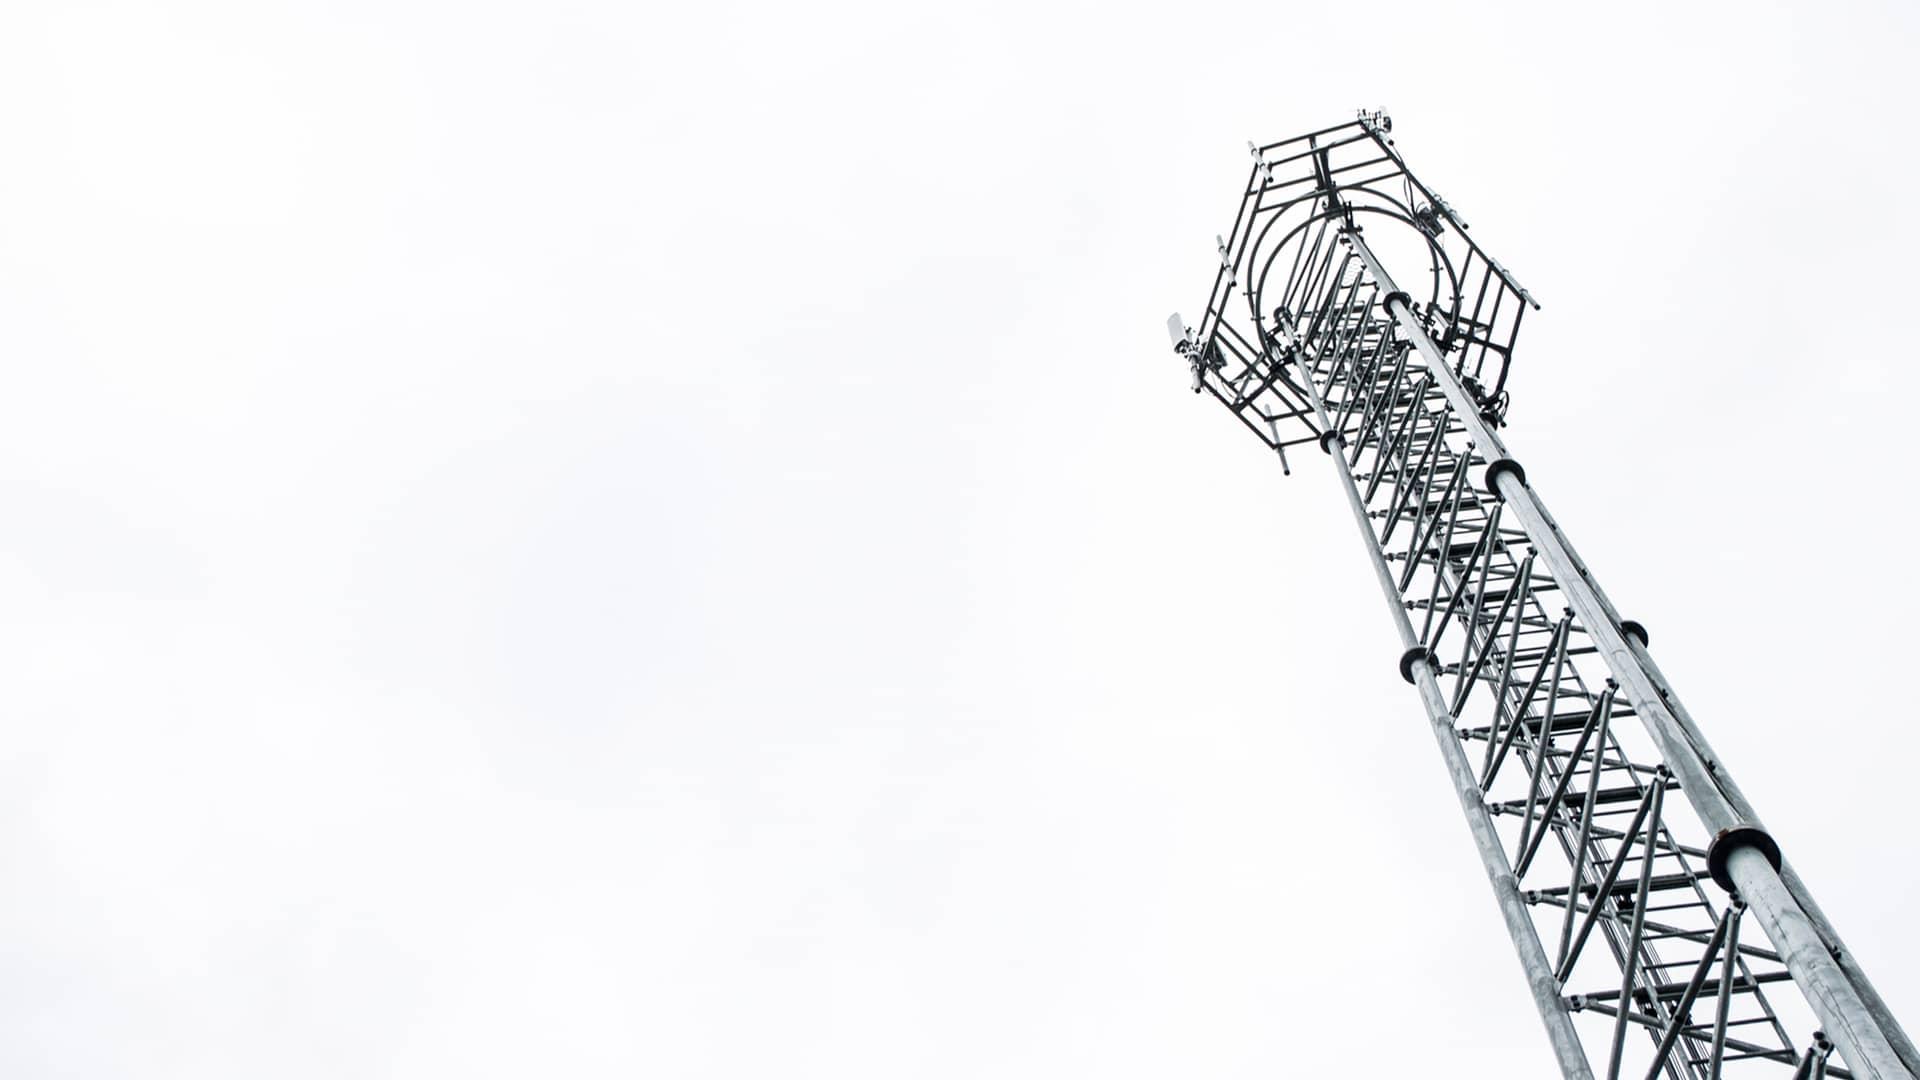 Antena de telefonía simboliza cobertura compañía mundor